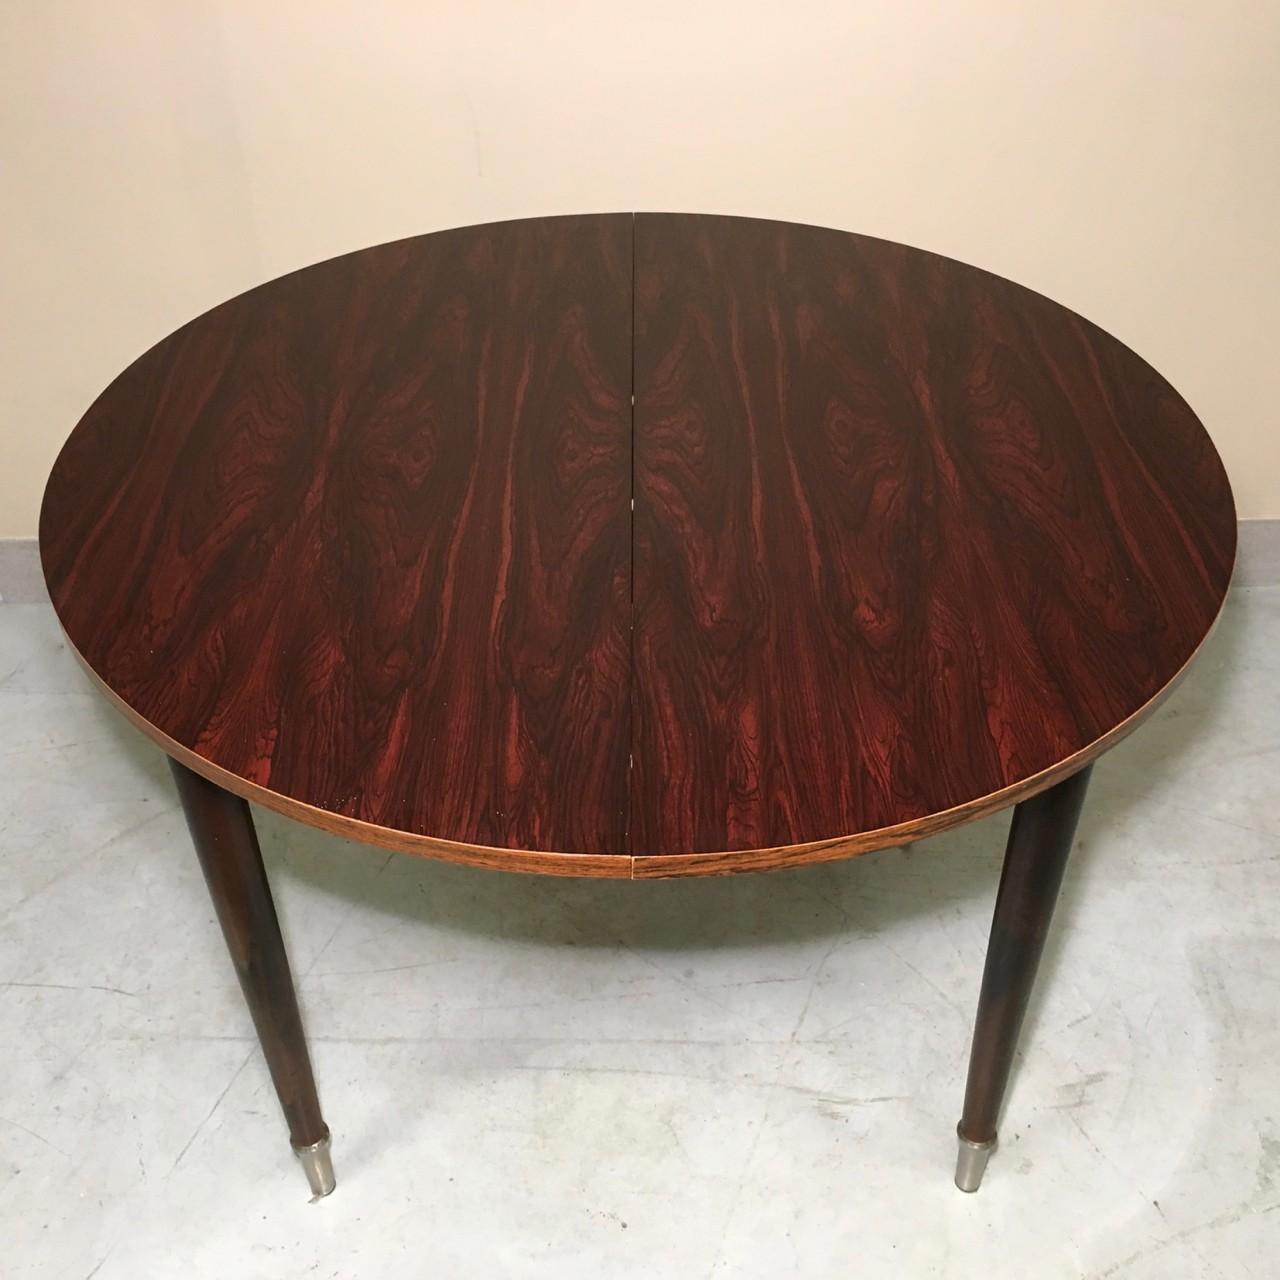 Vintage design dining table Claudia Collections : vintage design dining table from claudiacollections.com size 1280 x 1280 jpeg 203kB